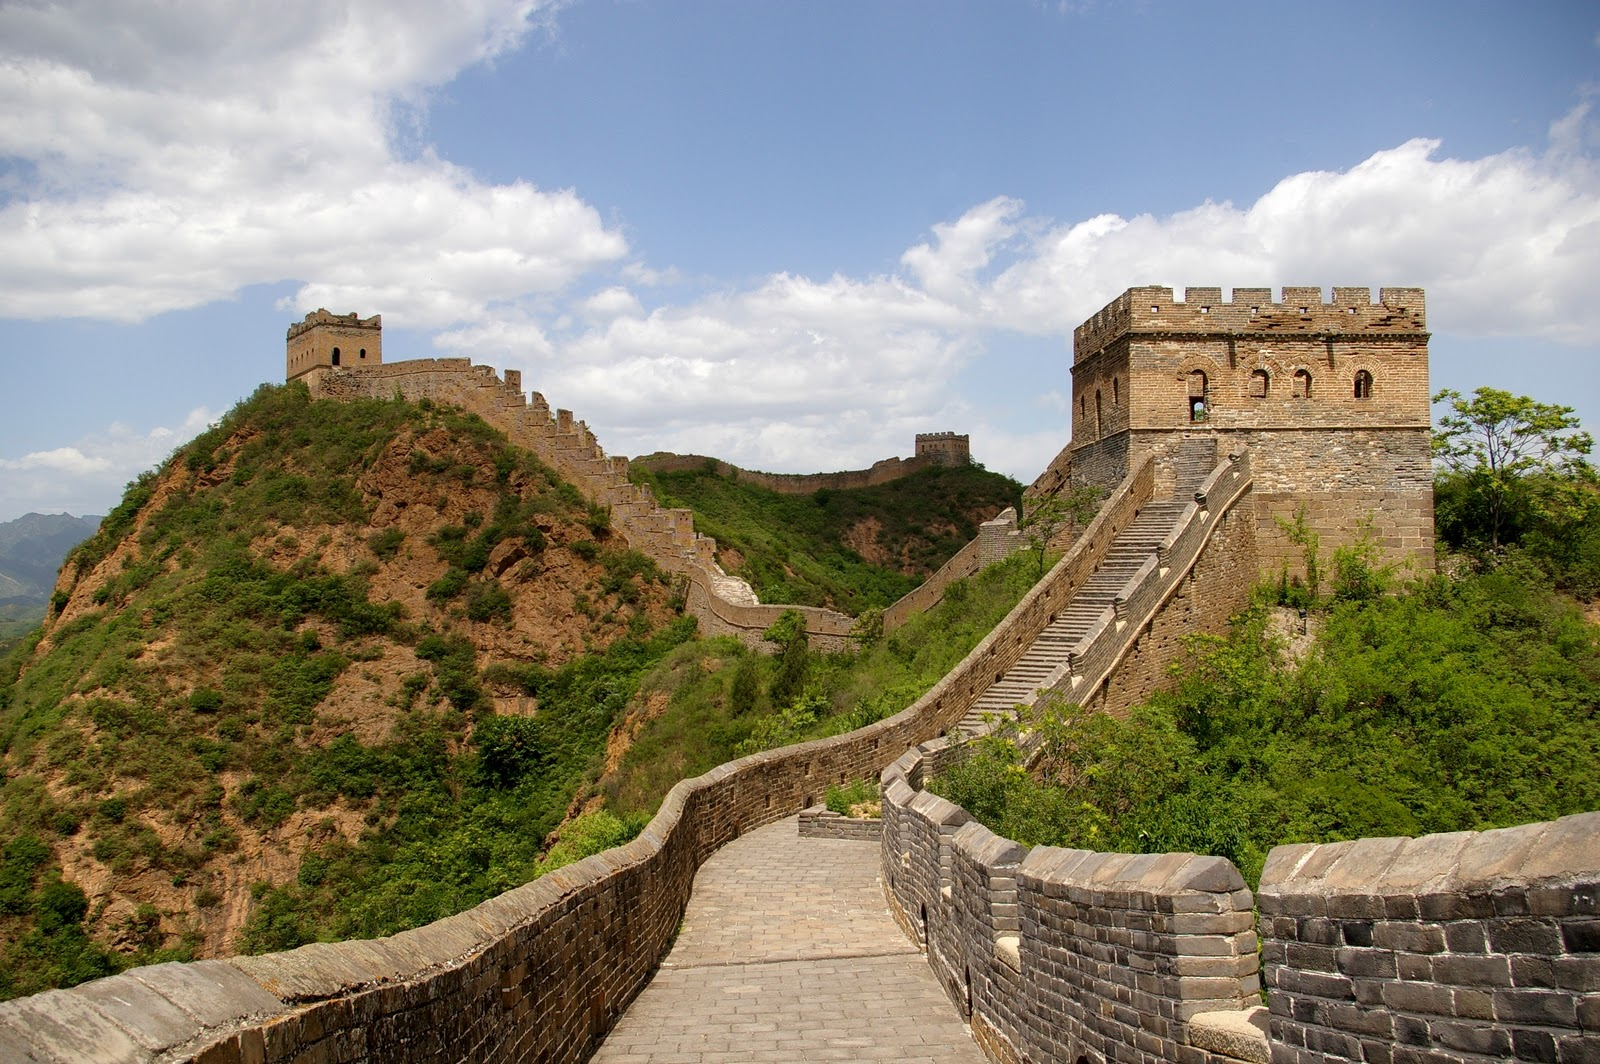 http://4.bp.blogspot.com/-RxecFc2UTgQ/TprJnWaMIgI/AAAAAAAABL8/V2qnYAZ7s-8/s1600/Great+Wall+of+China+wallpapers-5.jpg